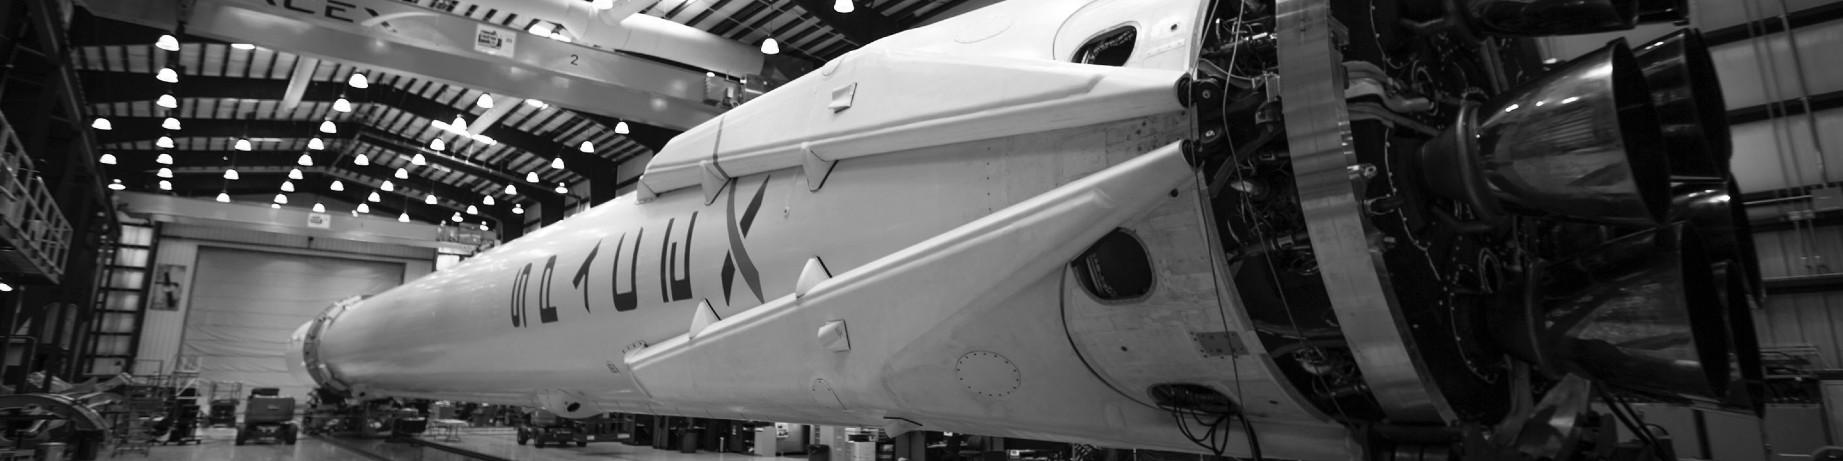 aeronautique-aerospatial-impression-3d